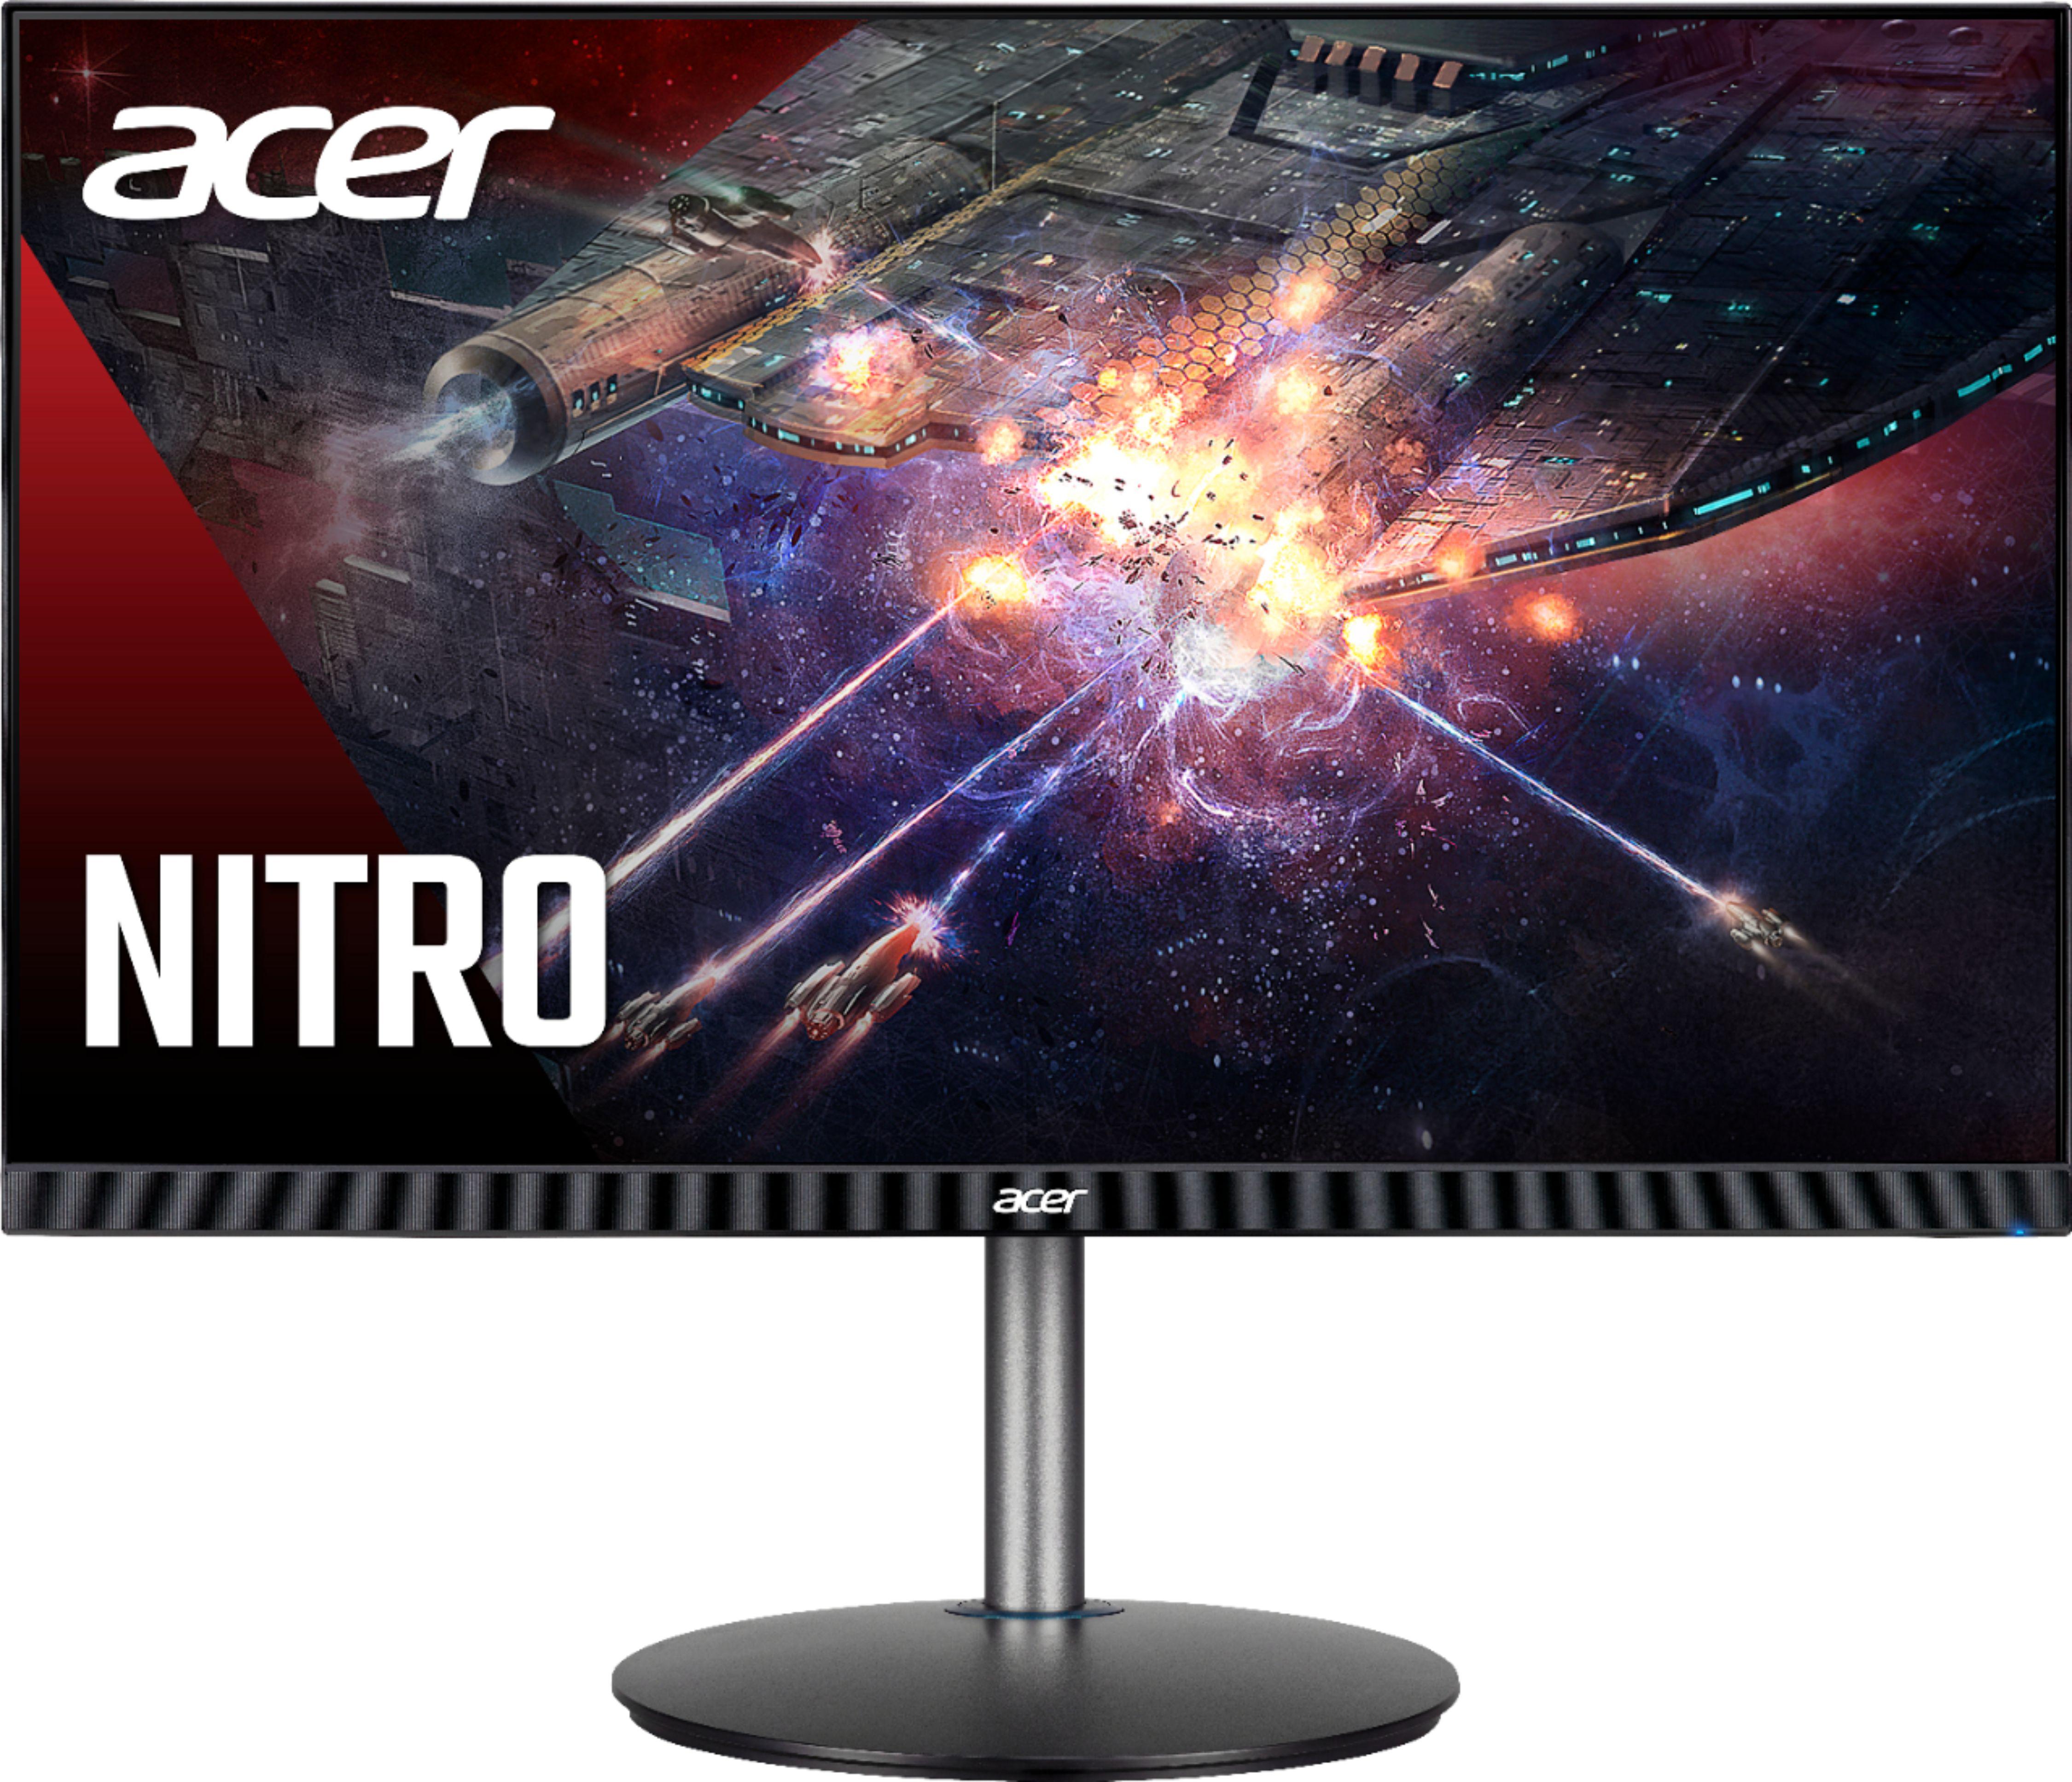 Acer - Nitro XF243Y $180